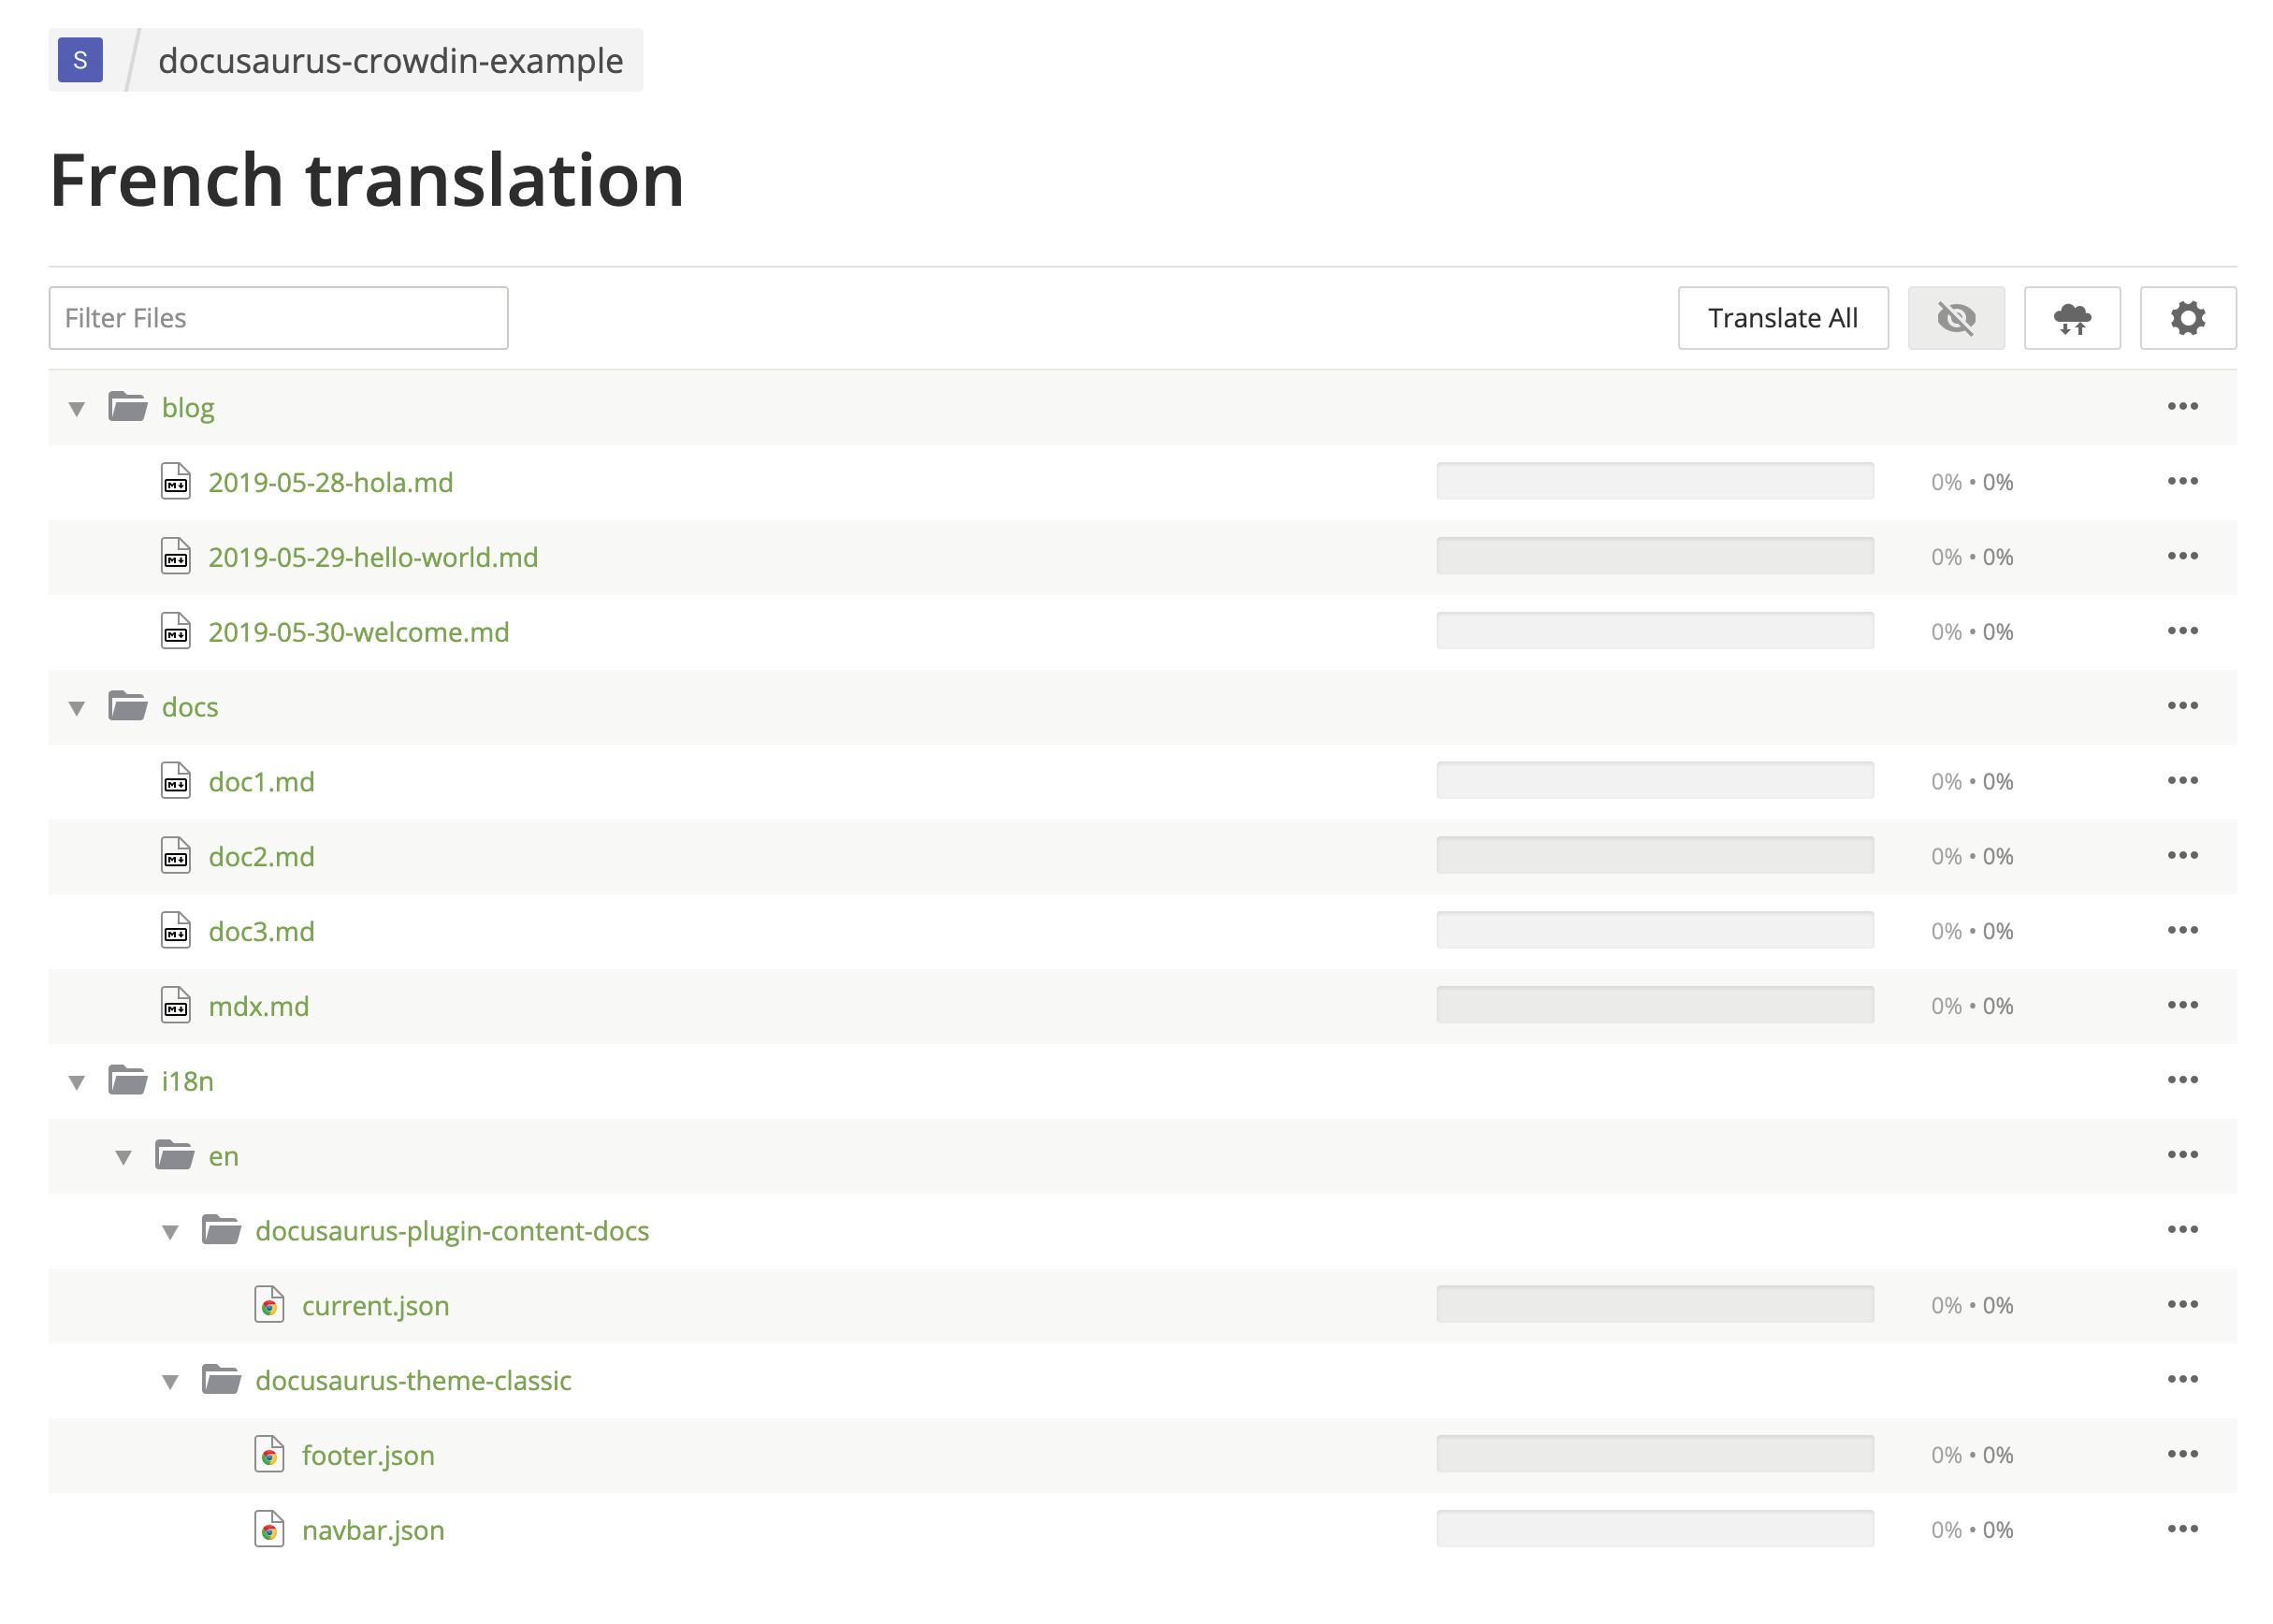 Crowdin UI 显示简体中文翻译文件